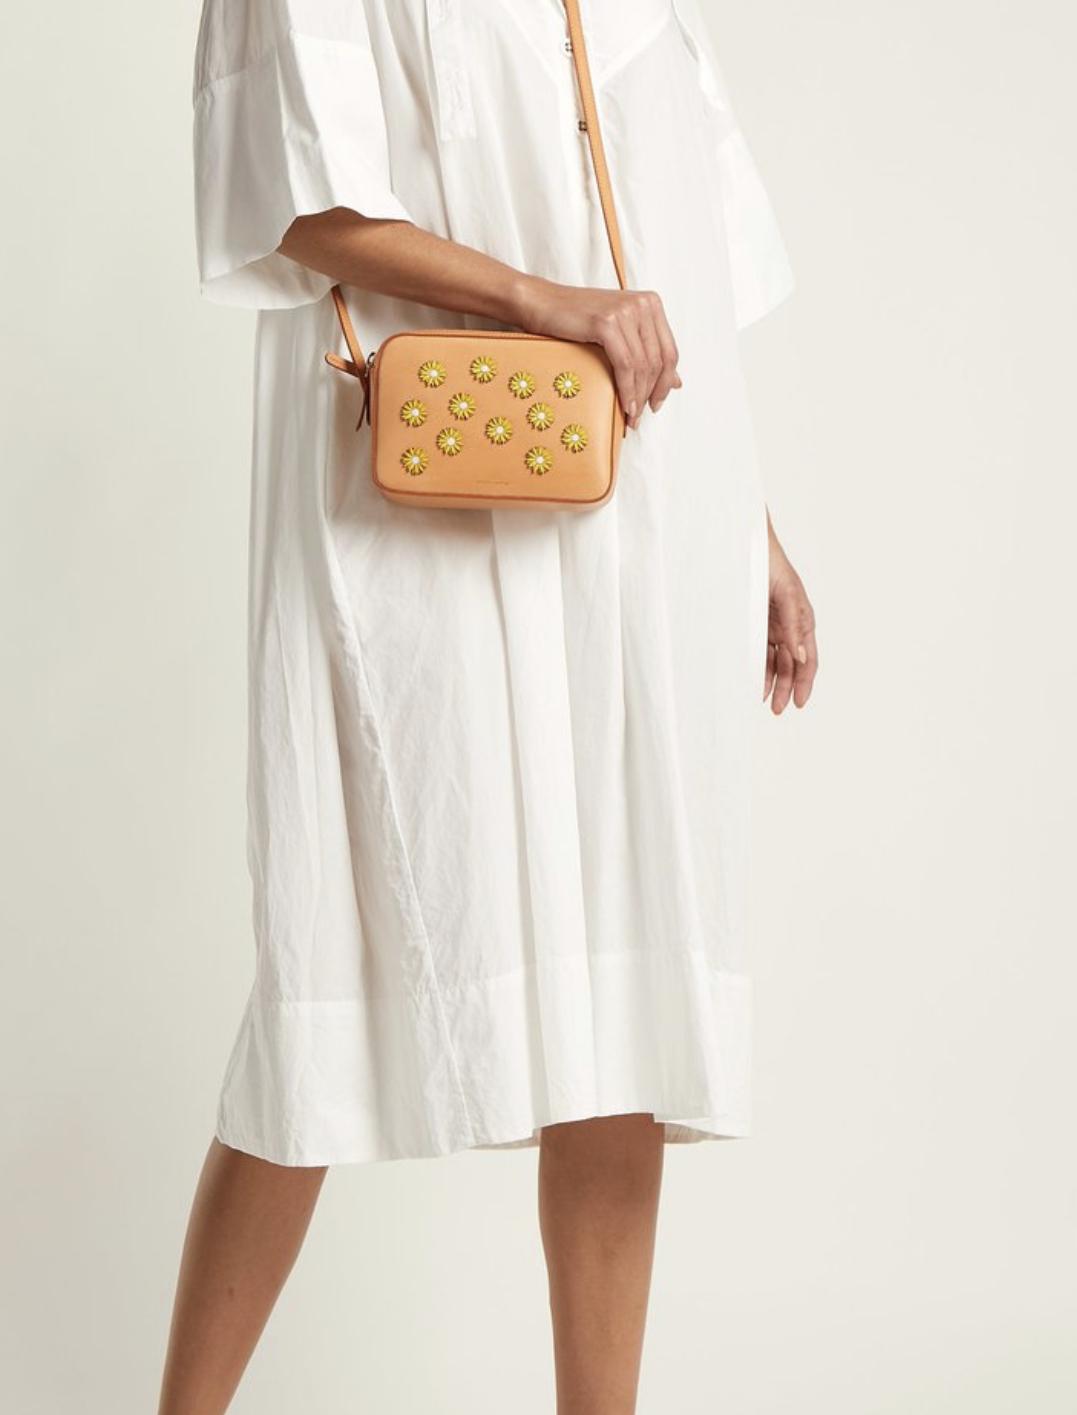 Crossbody Bag $500 😮🤢